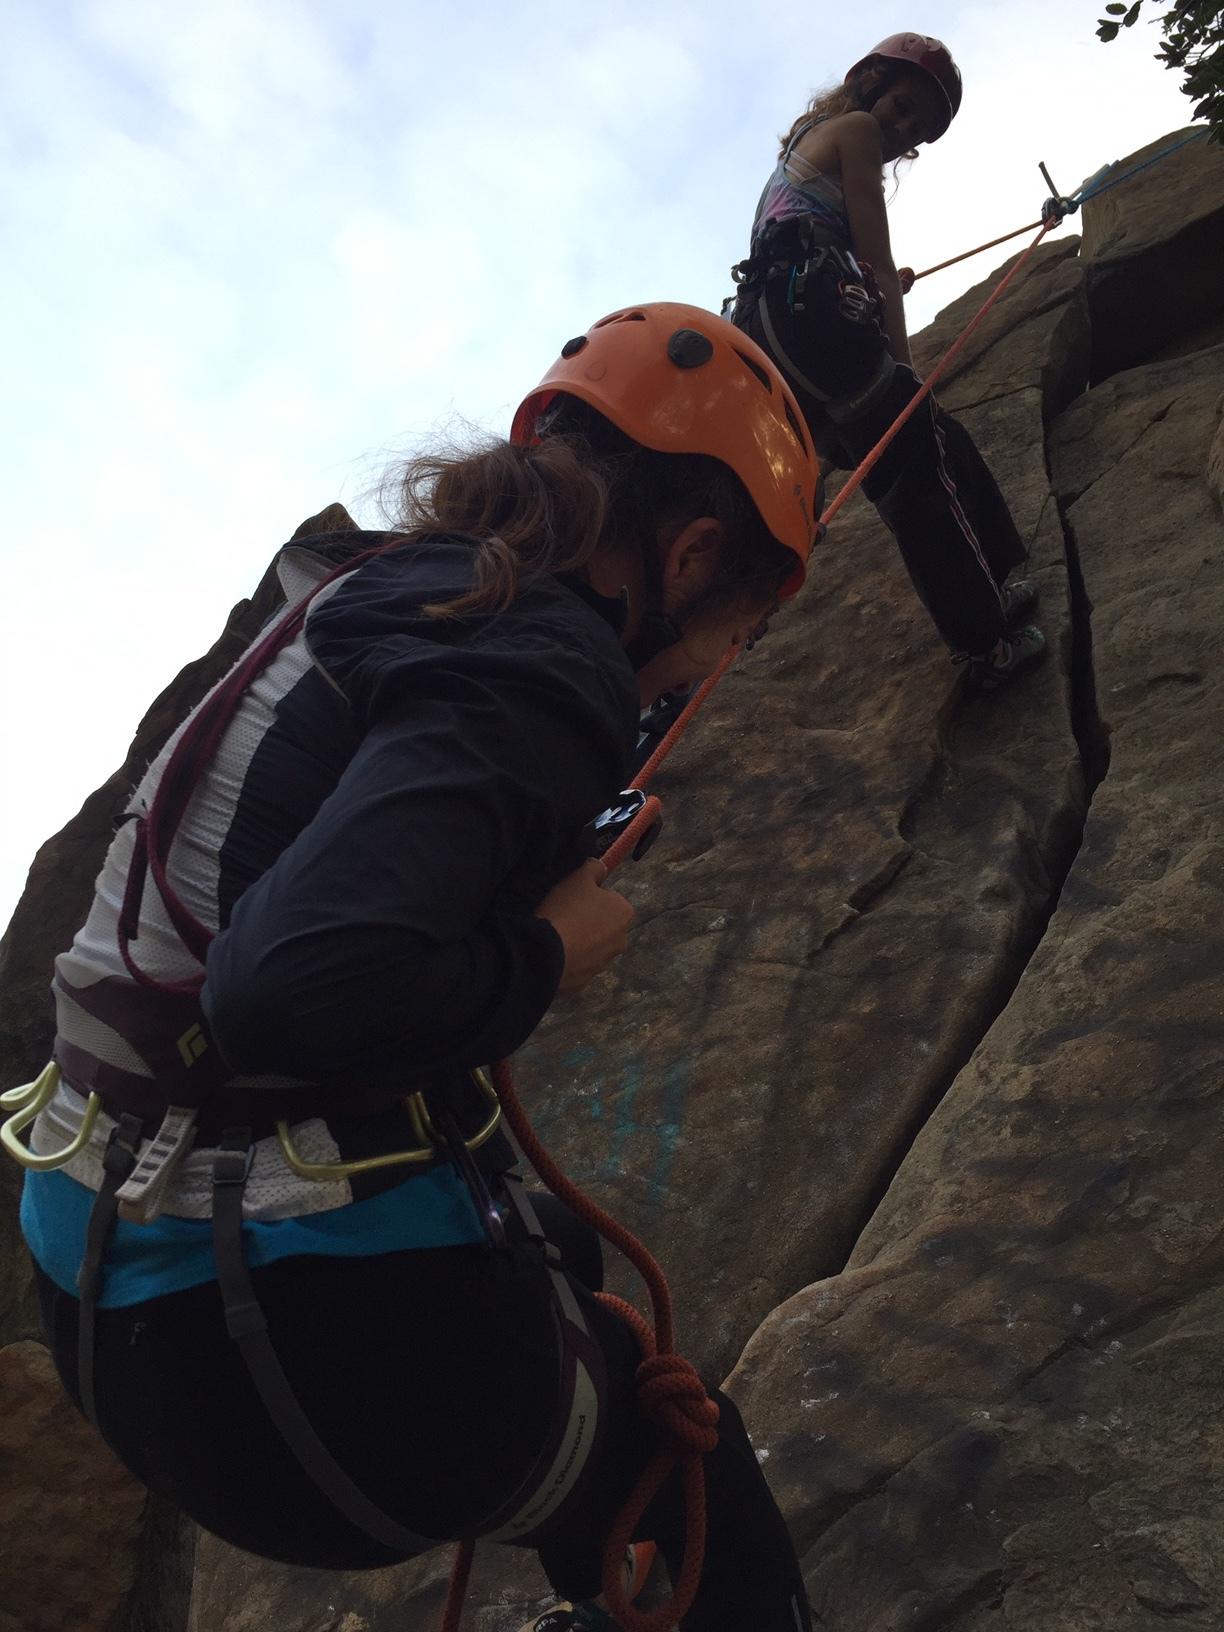 Partner Rescue Alpine Climber Rock Climbing SAANO Adventures Trad Climbing Multi Pitch.JPG